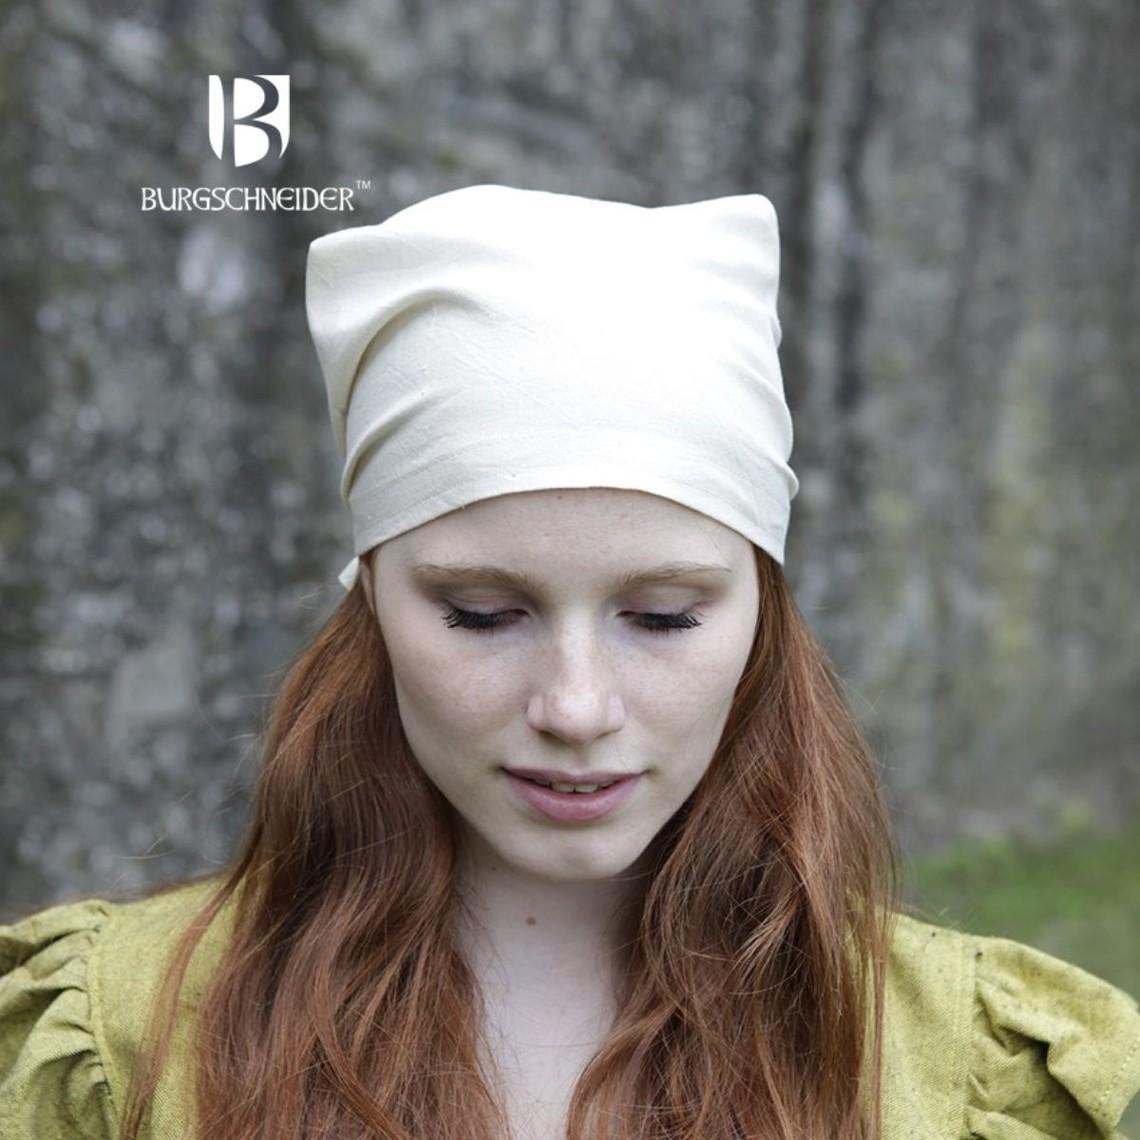 Burgschneider Pañoleta Vikinga Marianne color natural